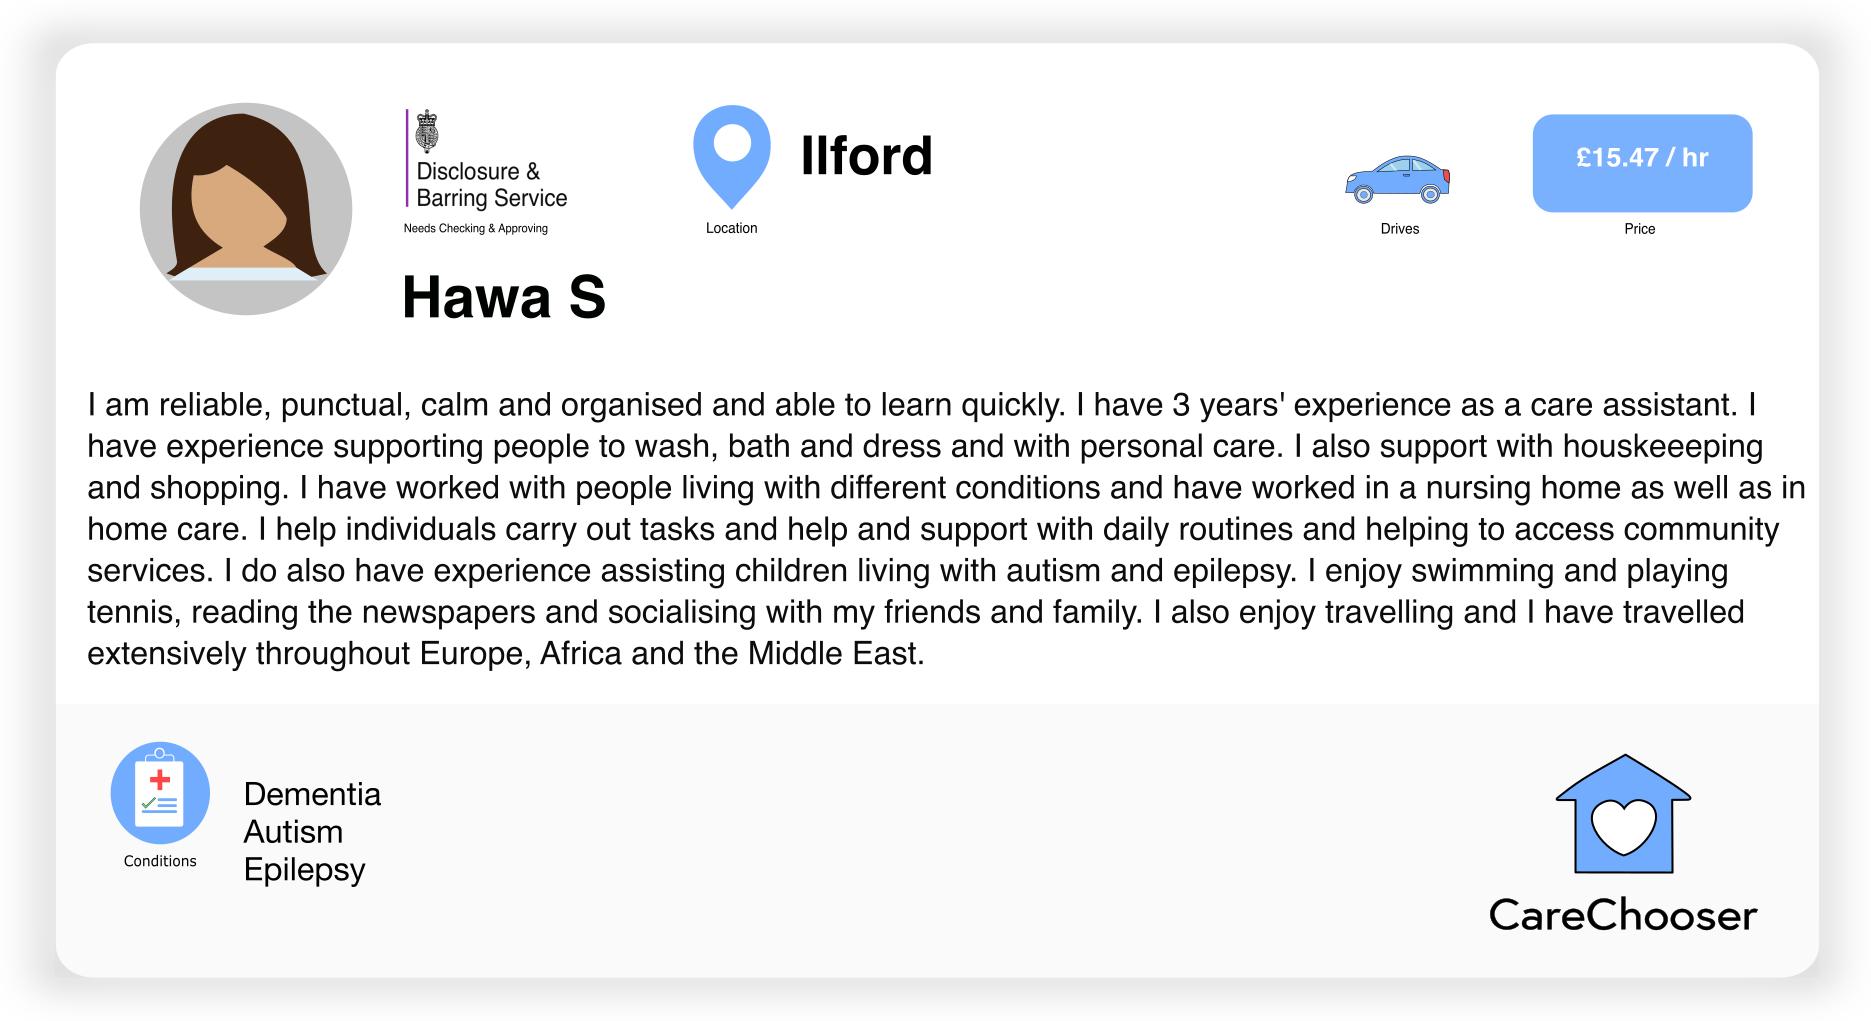 Hawa - Home Care - Ilford.png